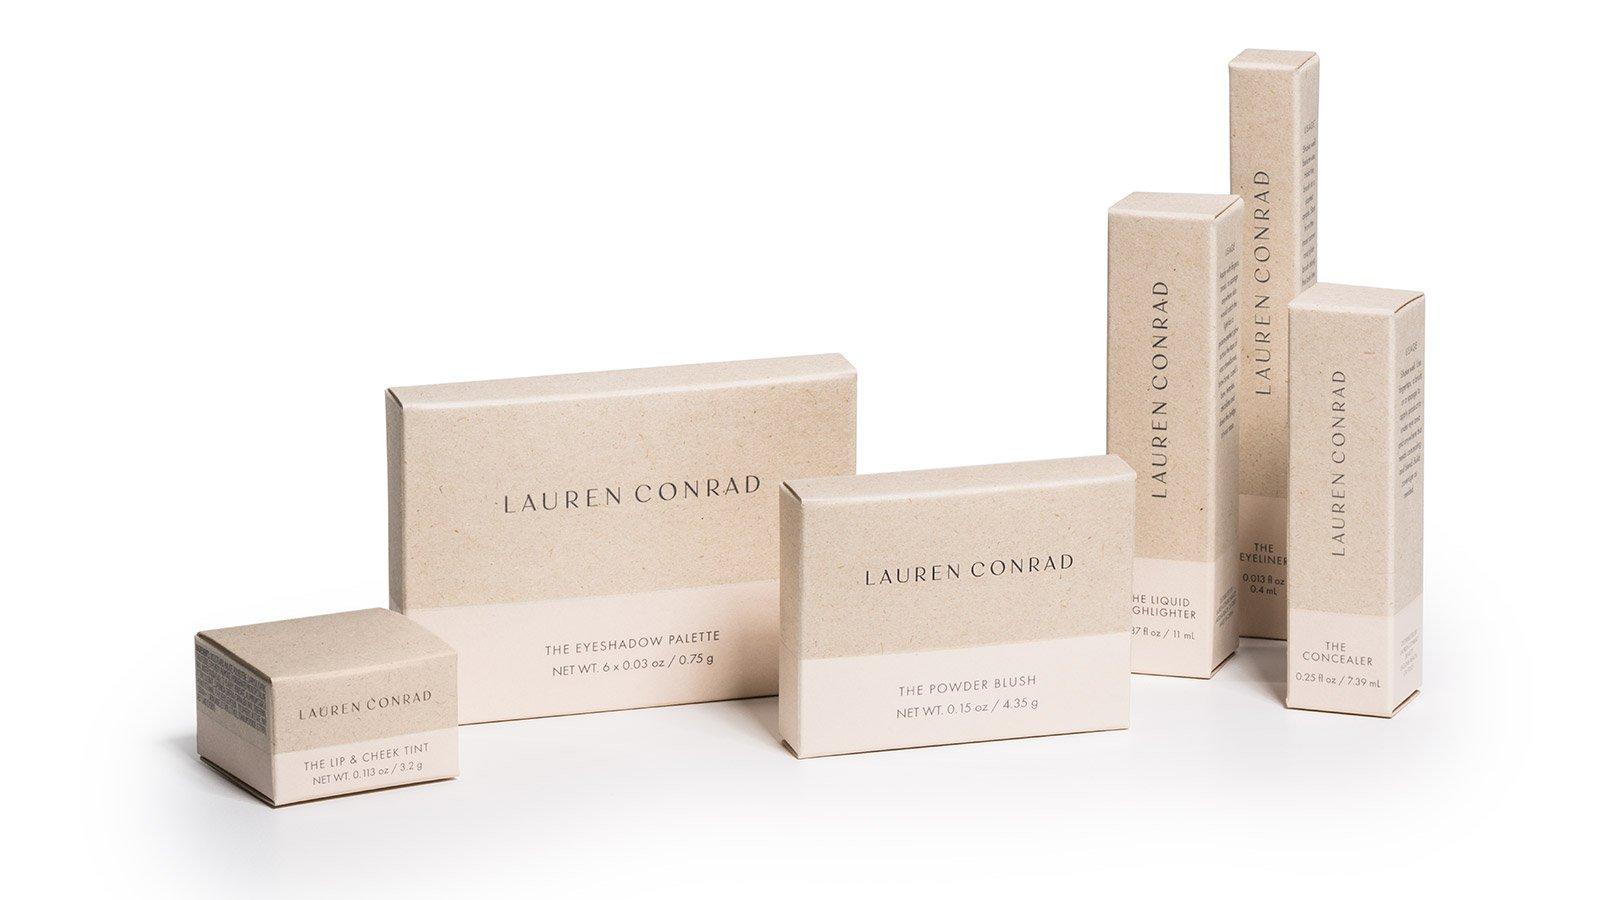 Lauren Conrad Cosmetic Packaging